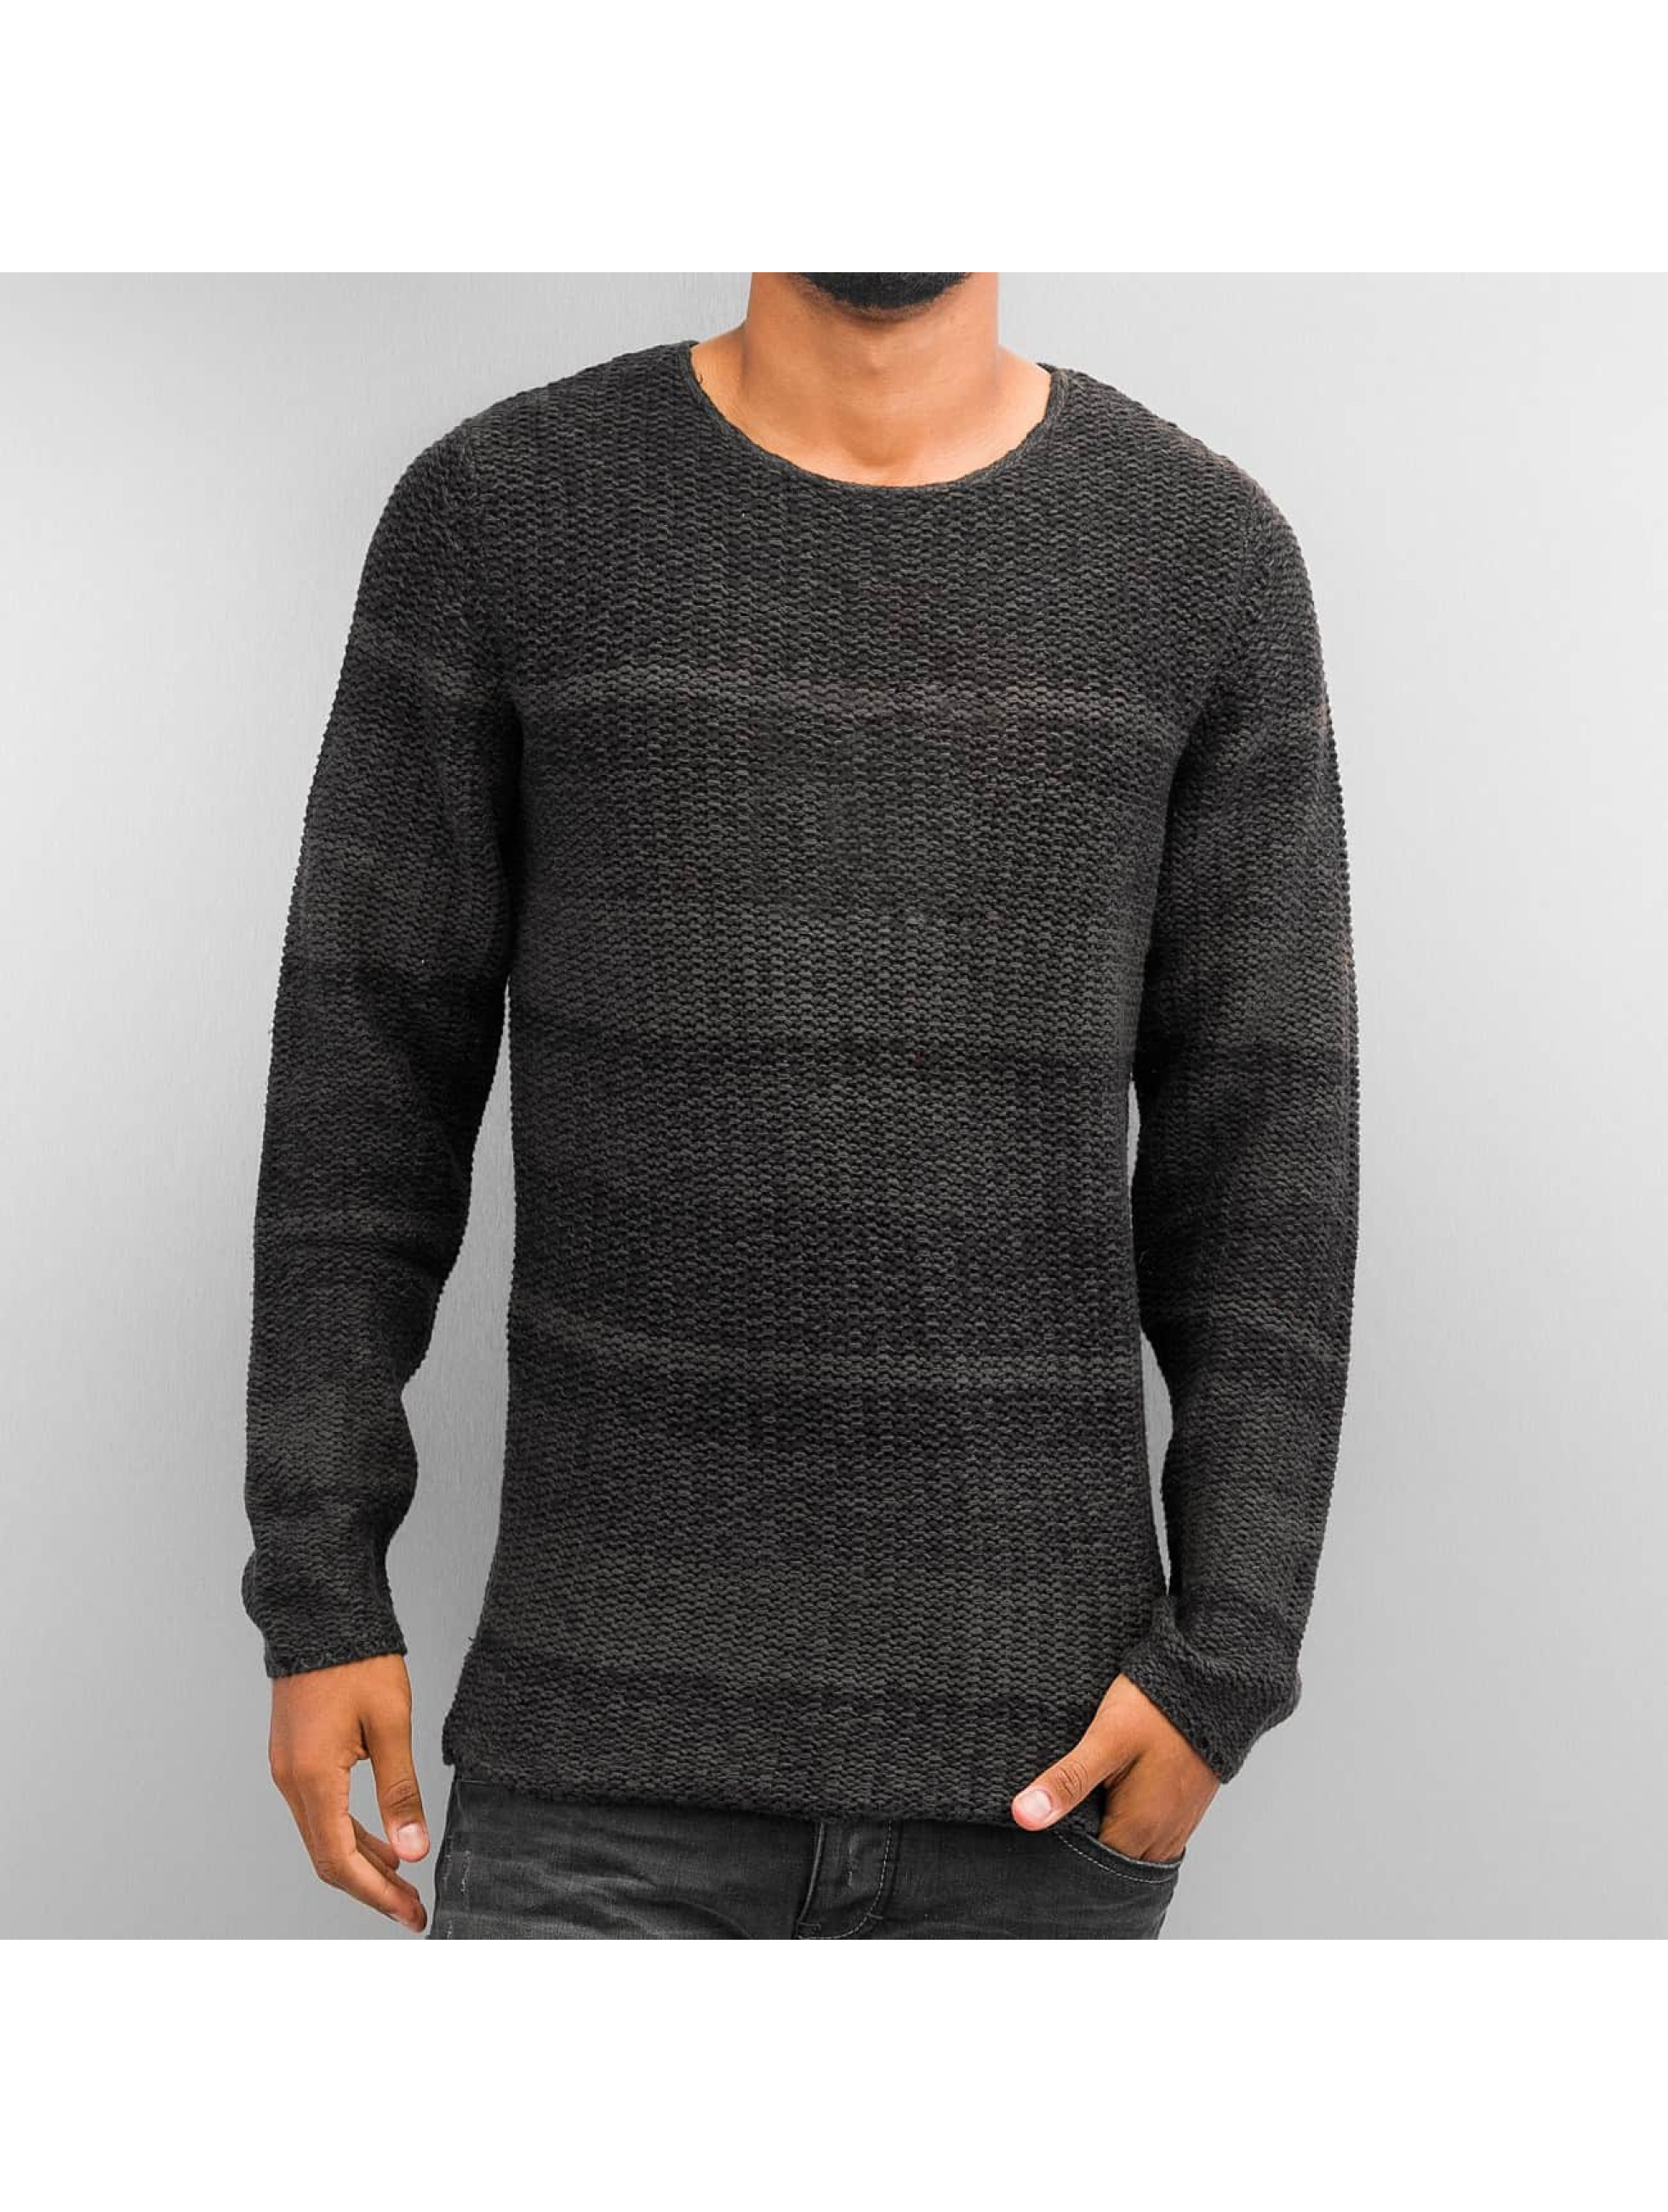 SHINE Original Pullover Mixed schwarz